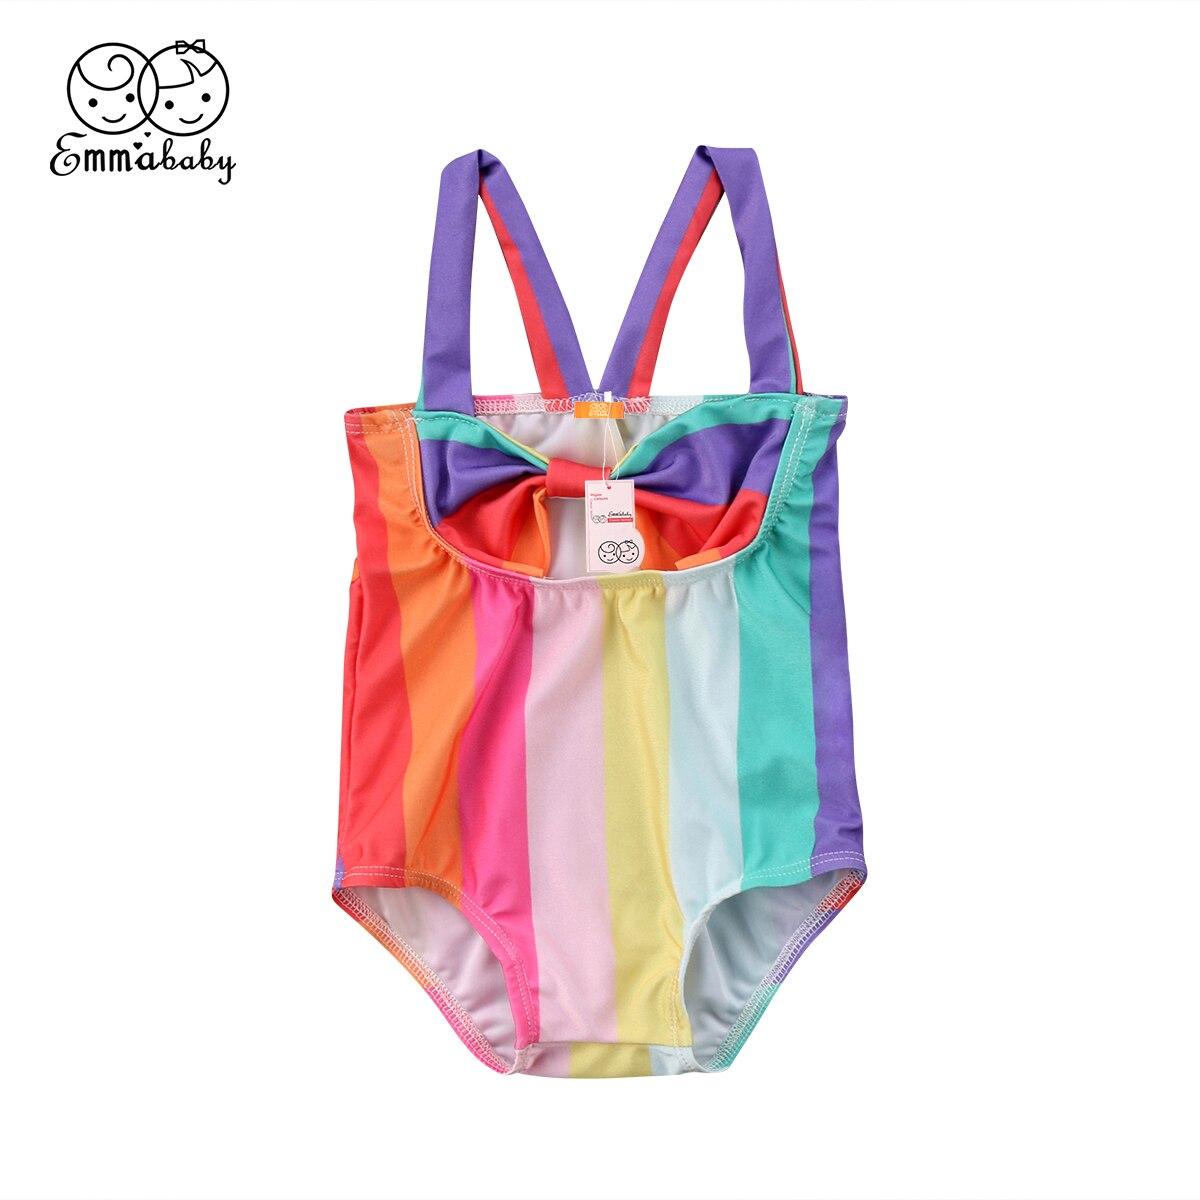 2018 Latest Childrens Wear Toddler Infant Kid Baby Girl Rainbow Stripe Halter Swimsuit Swimwear -5329